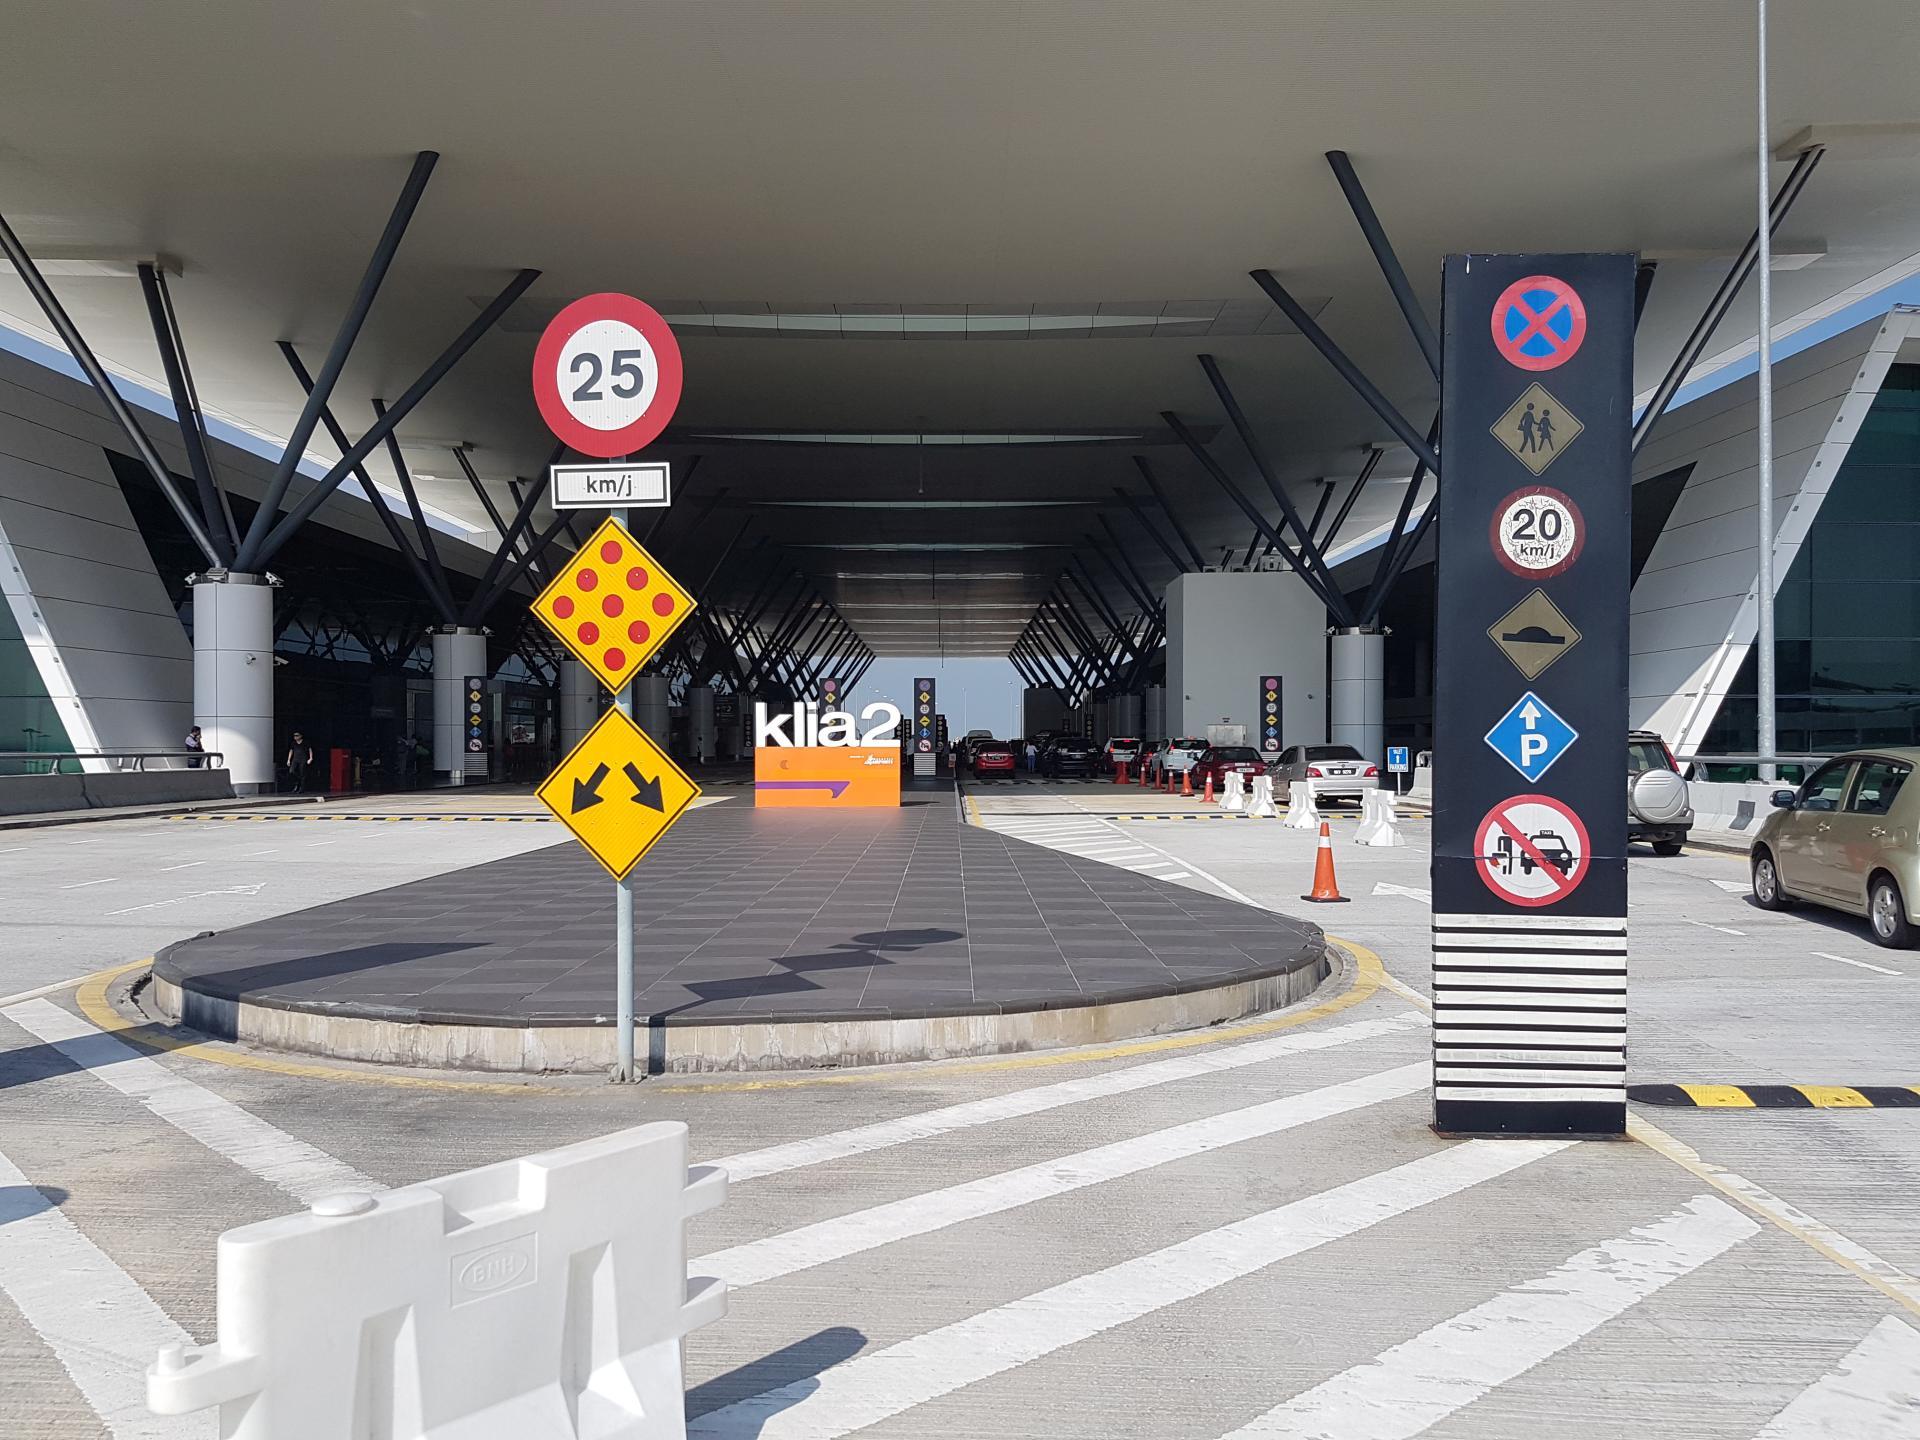 Аэропорт KLIA2 Куала Лумпур